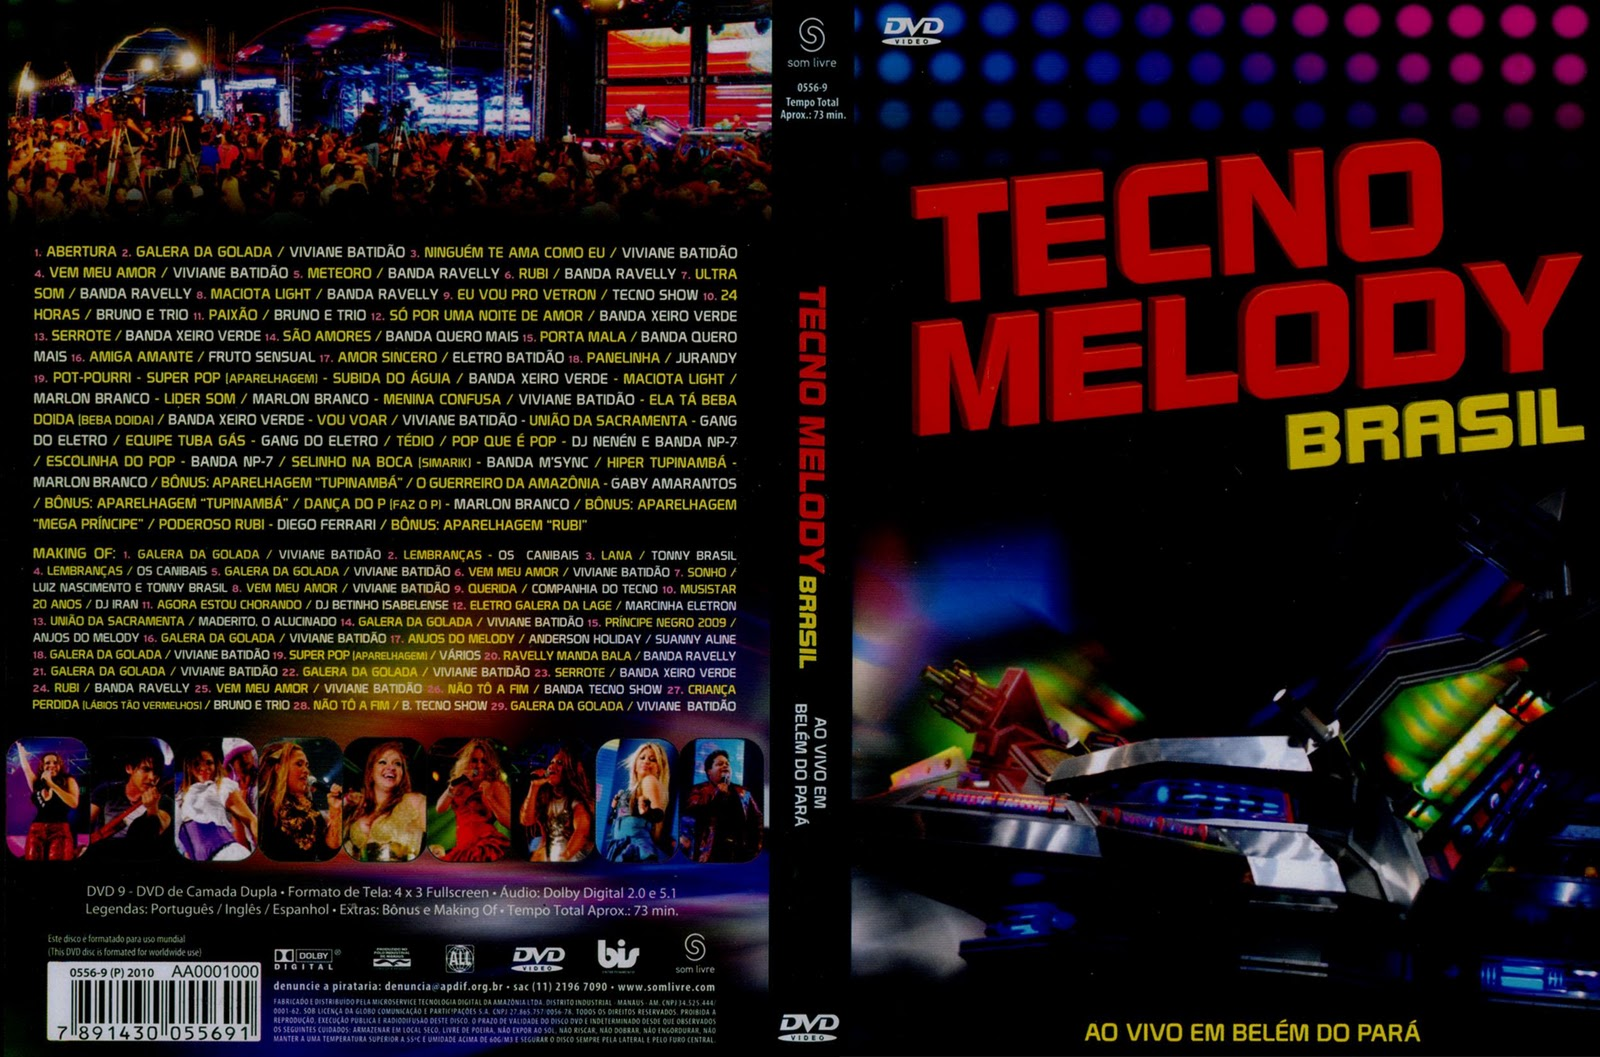 PALCO BAIXAR MP3 2013 MELODY TECNO